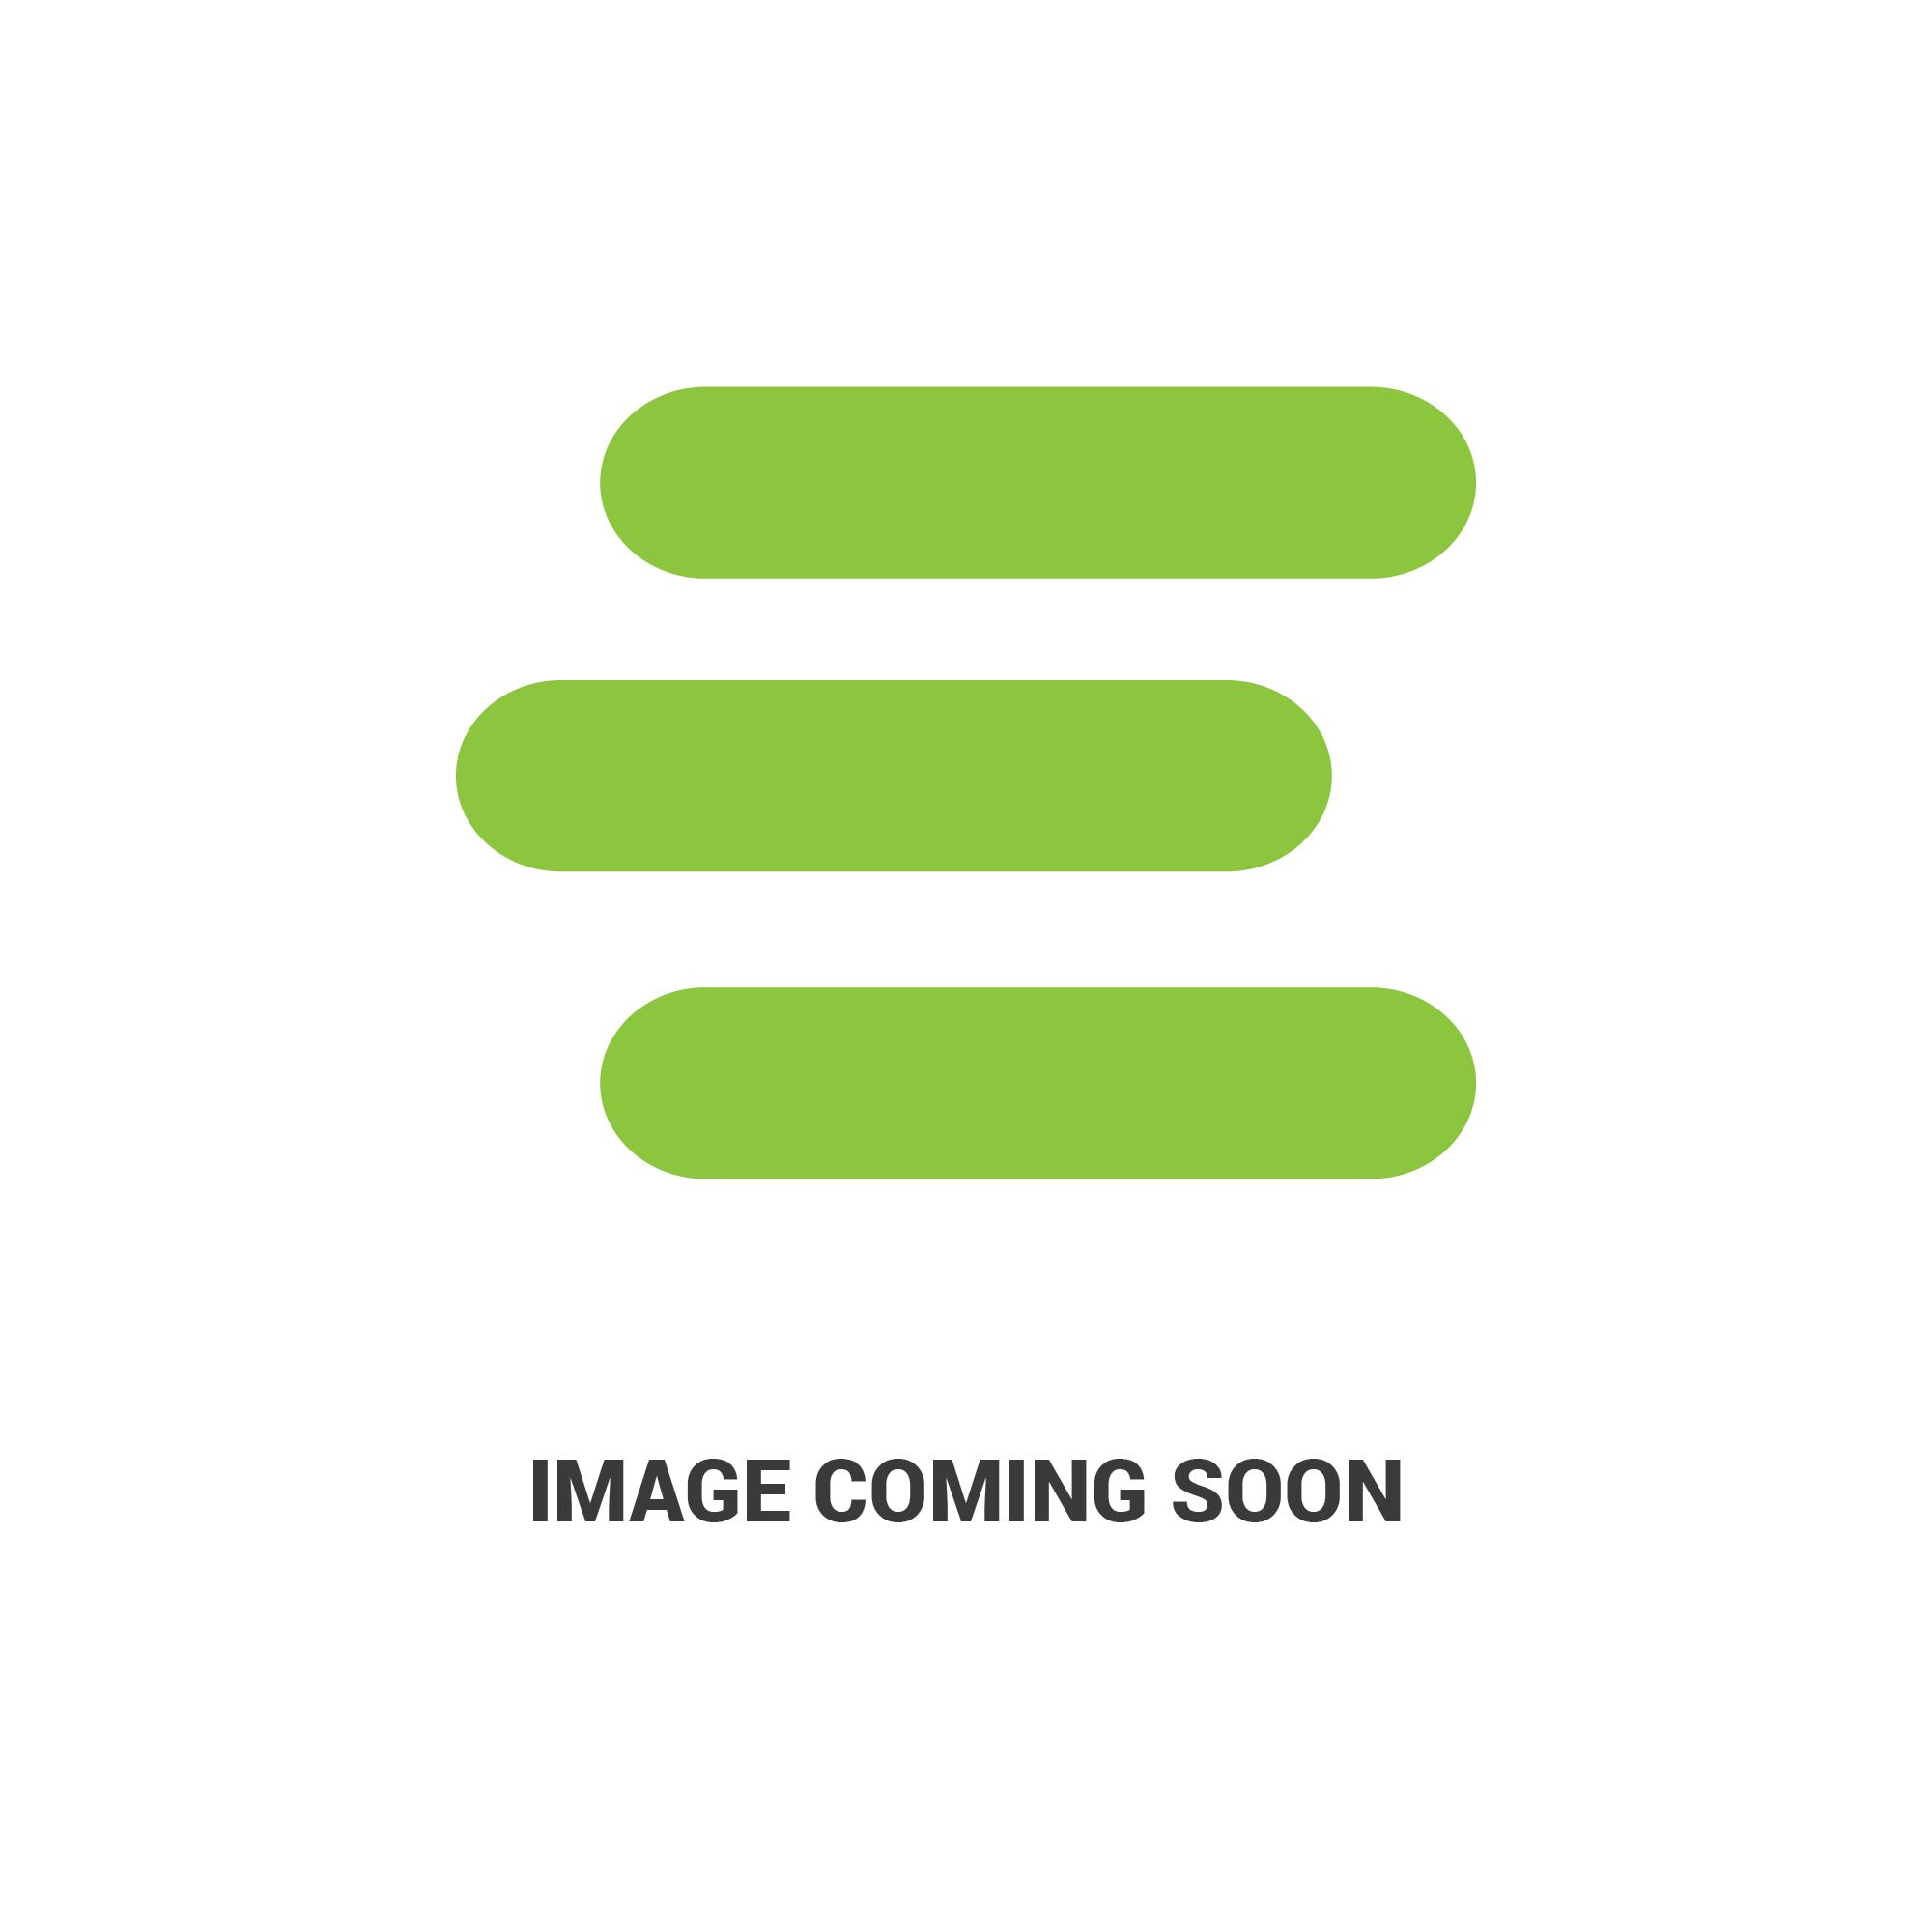 E-7003445edit 1.jpg